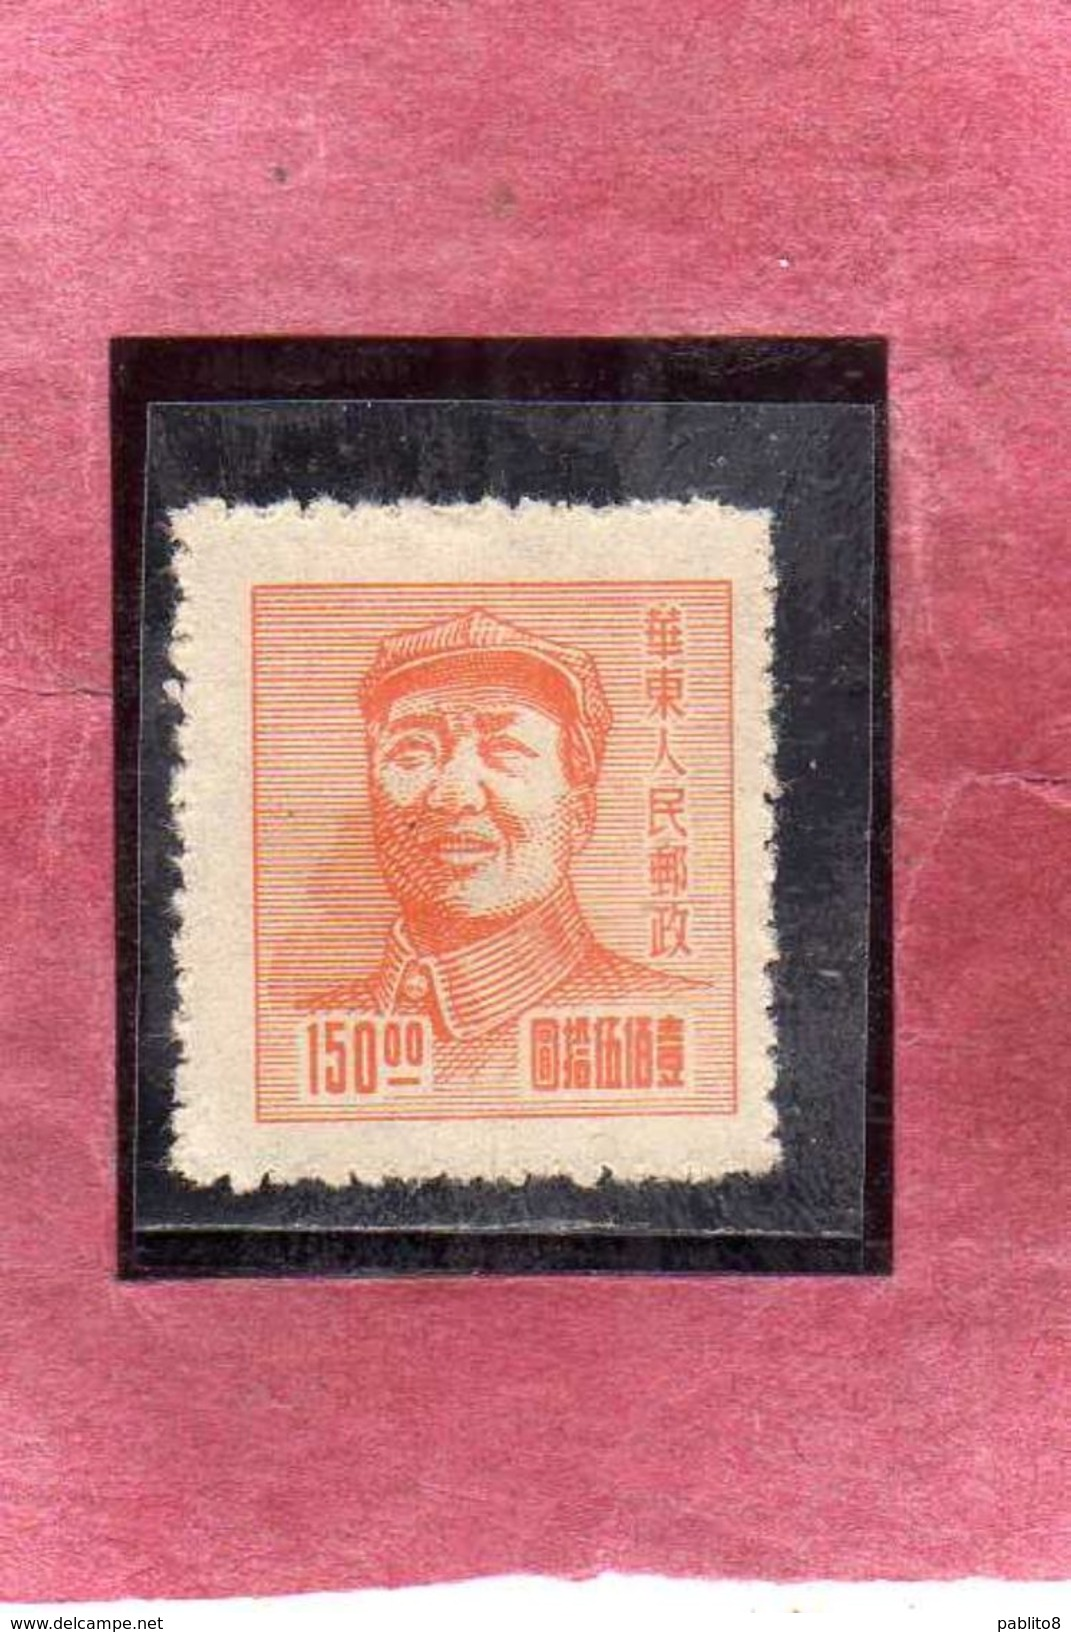 EAST CHINA CINA ORIENTALE 1949 LIBERATION AREA MAO TSE-TUNG 150$ MNH - Oost-China 1949-50